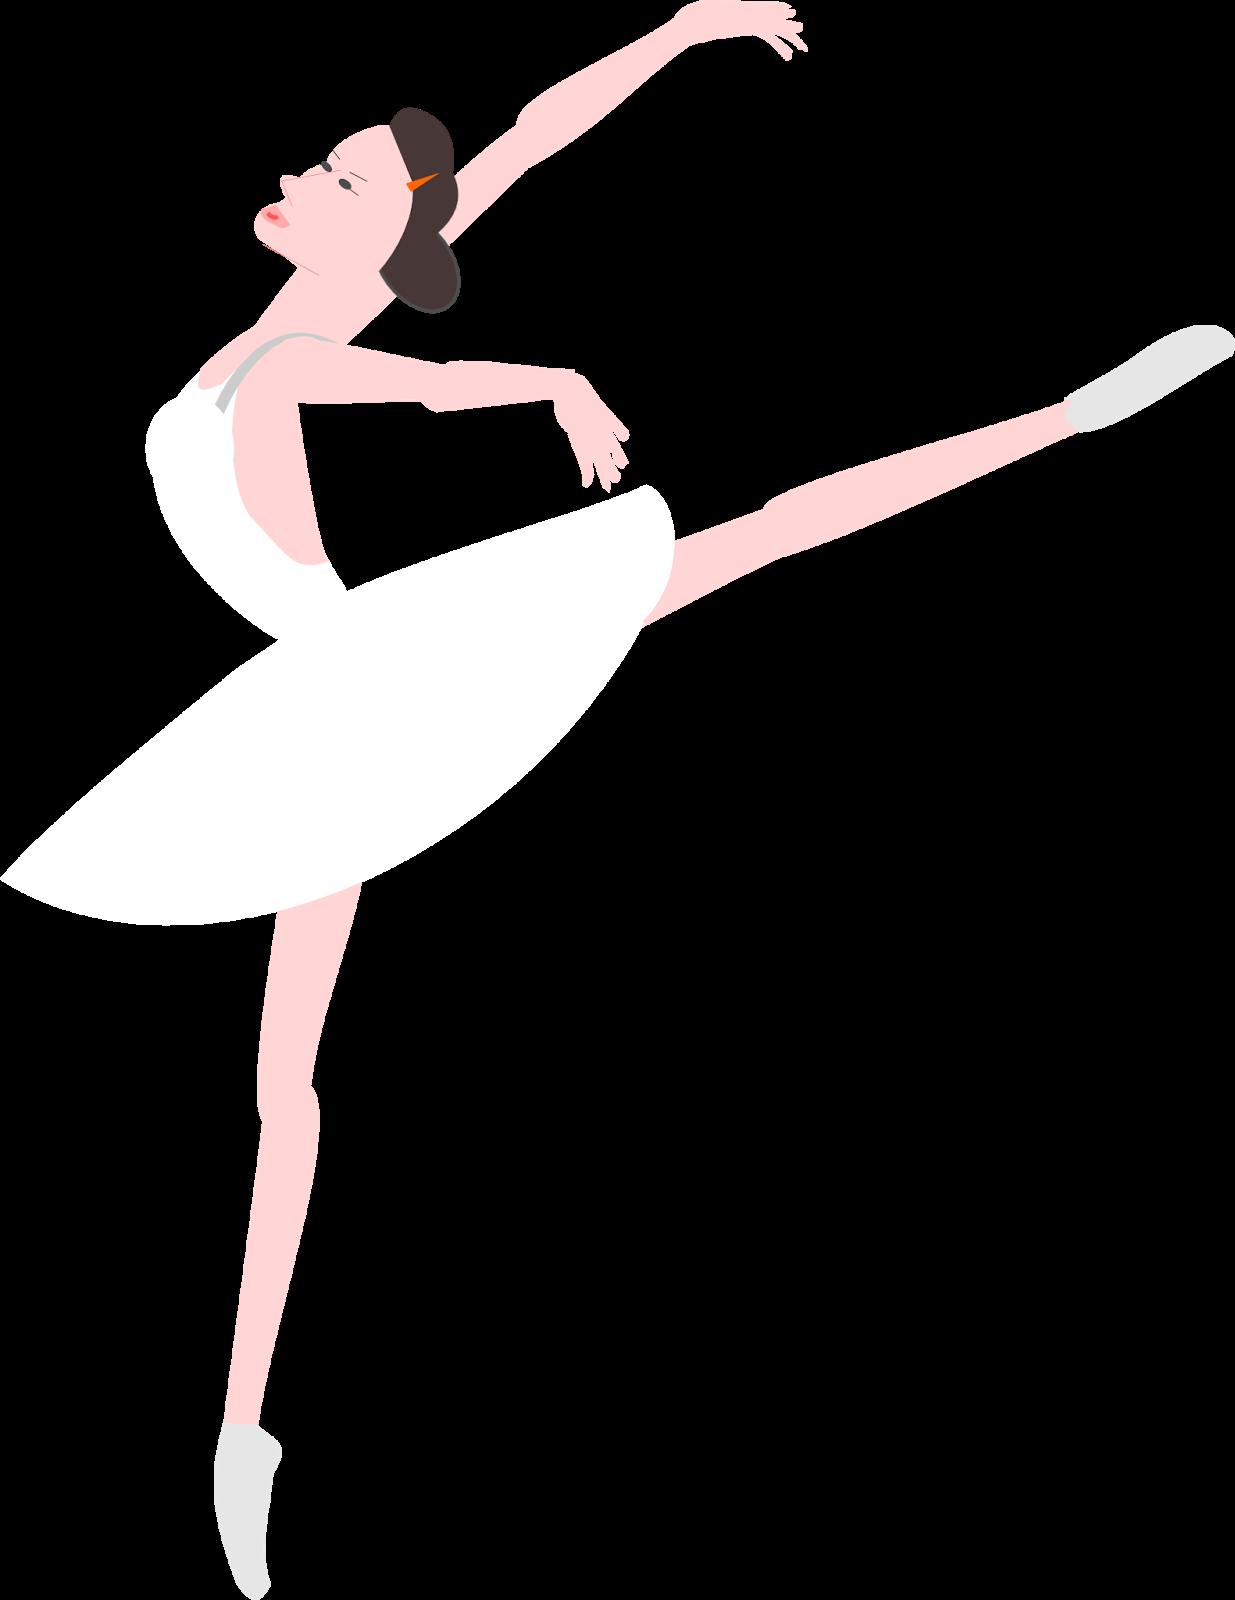 1235x1600 Free Printable Ballerina Png